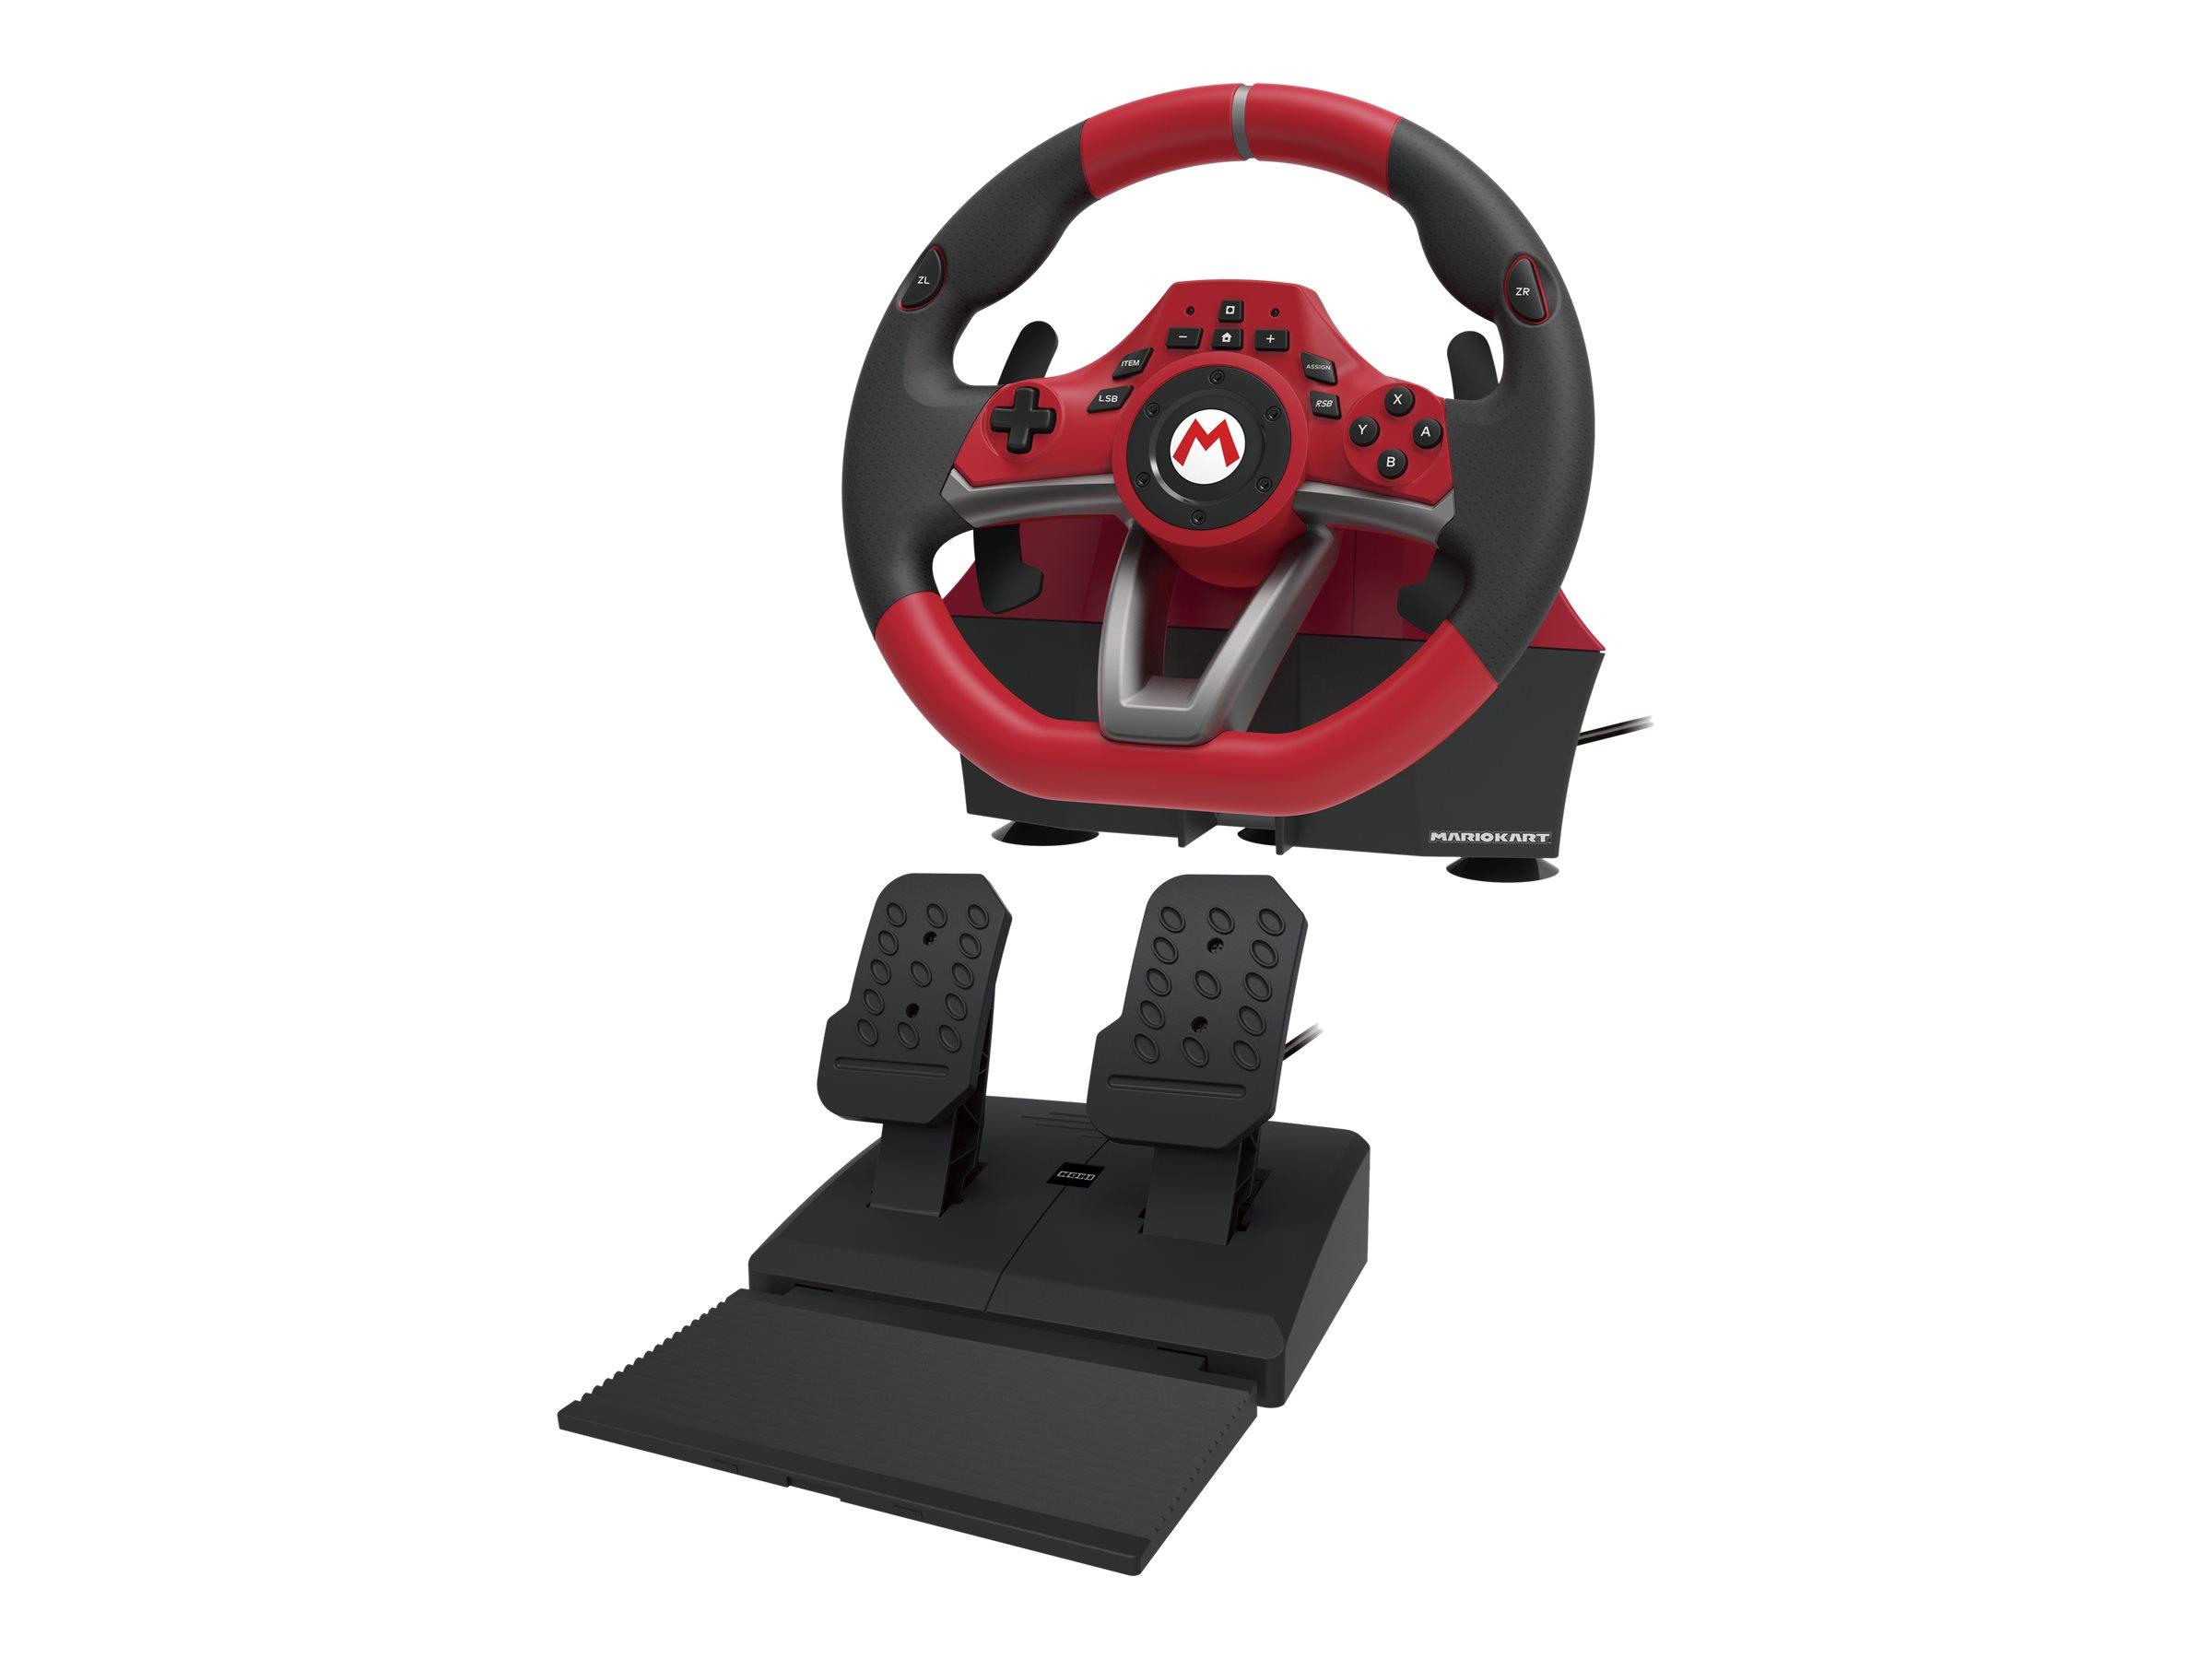 HORI Mario Kart Racing Wheel Pro Deluxe - Lenkrad- und Pedale-Set - kabelgebunden - für Nintendo Switch